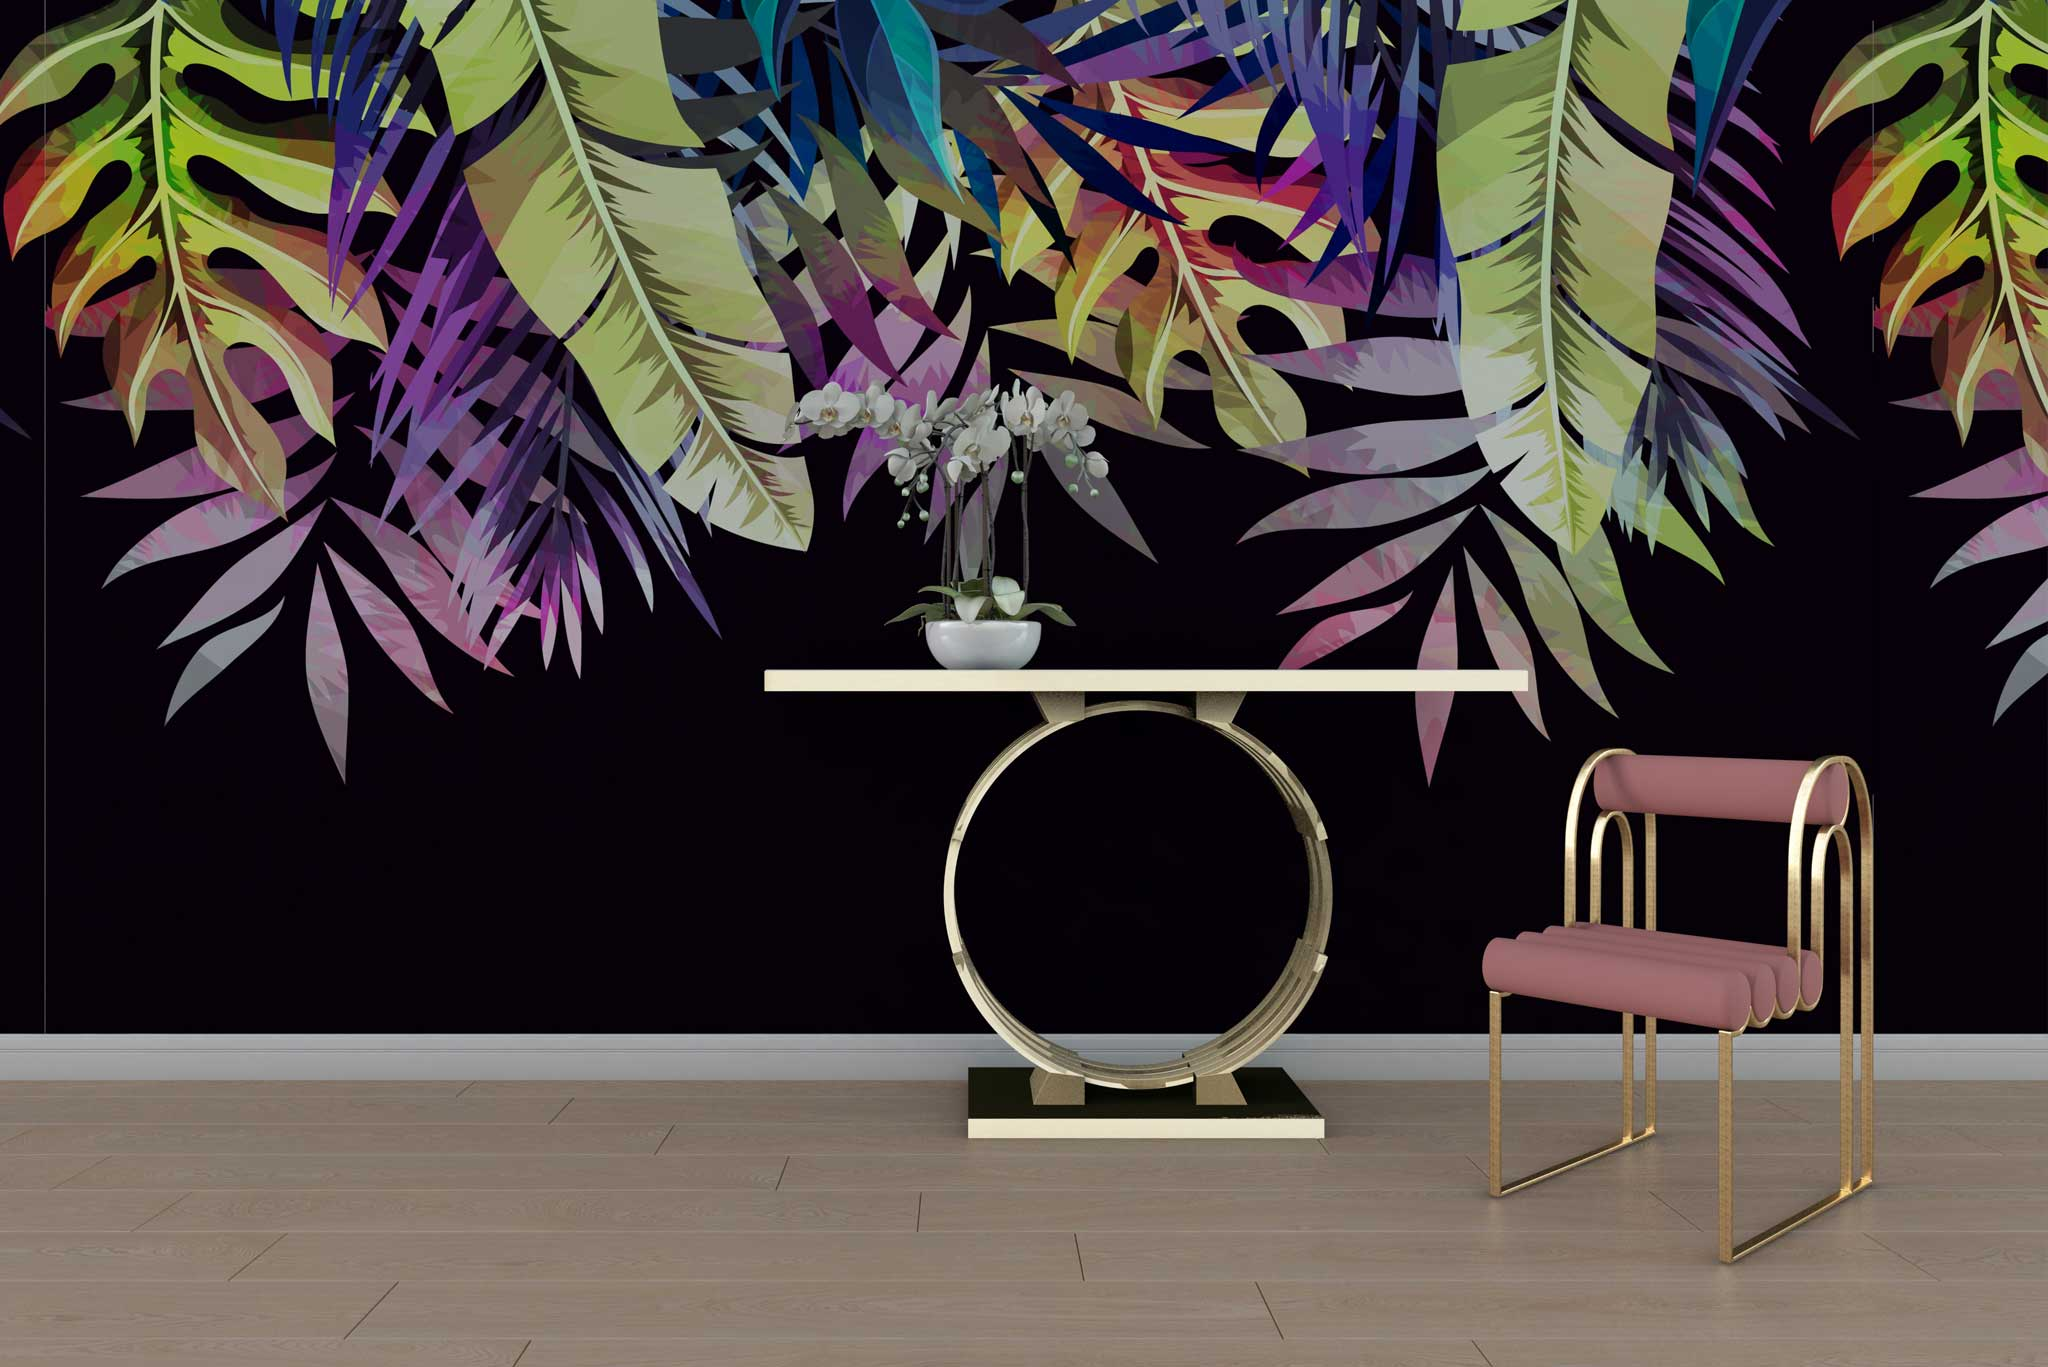 tapet-fototapet-personalizat-special-comanda-bucuresti-model-negru-frunze-exotice-colorate-lux